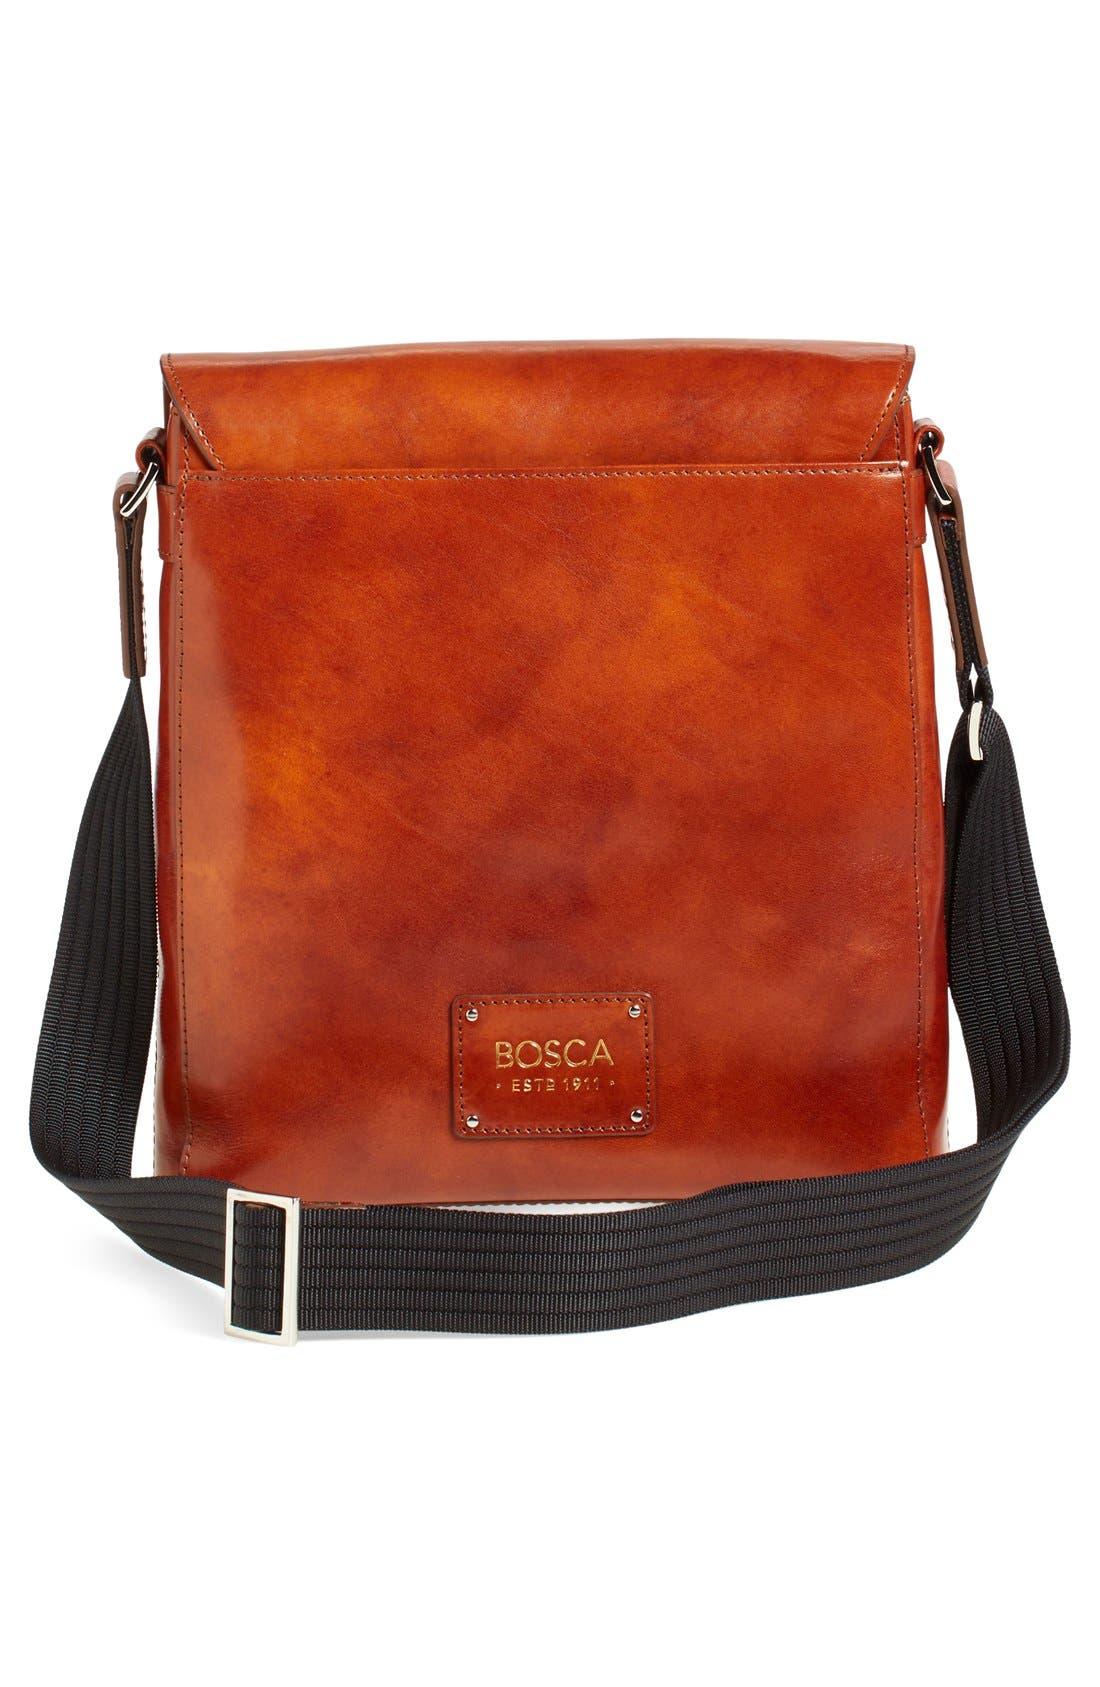 'Man Bag' Leather Crossbody Bag,                             Alternate thumbnail 3, color,                             233